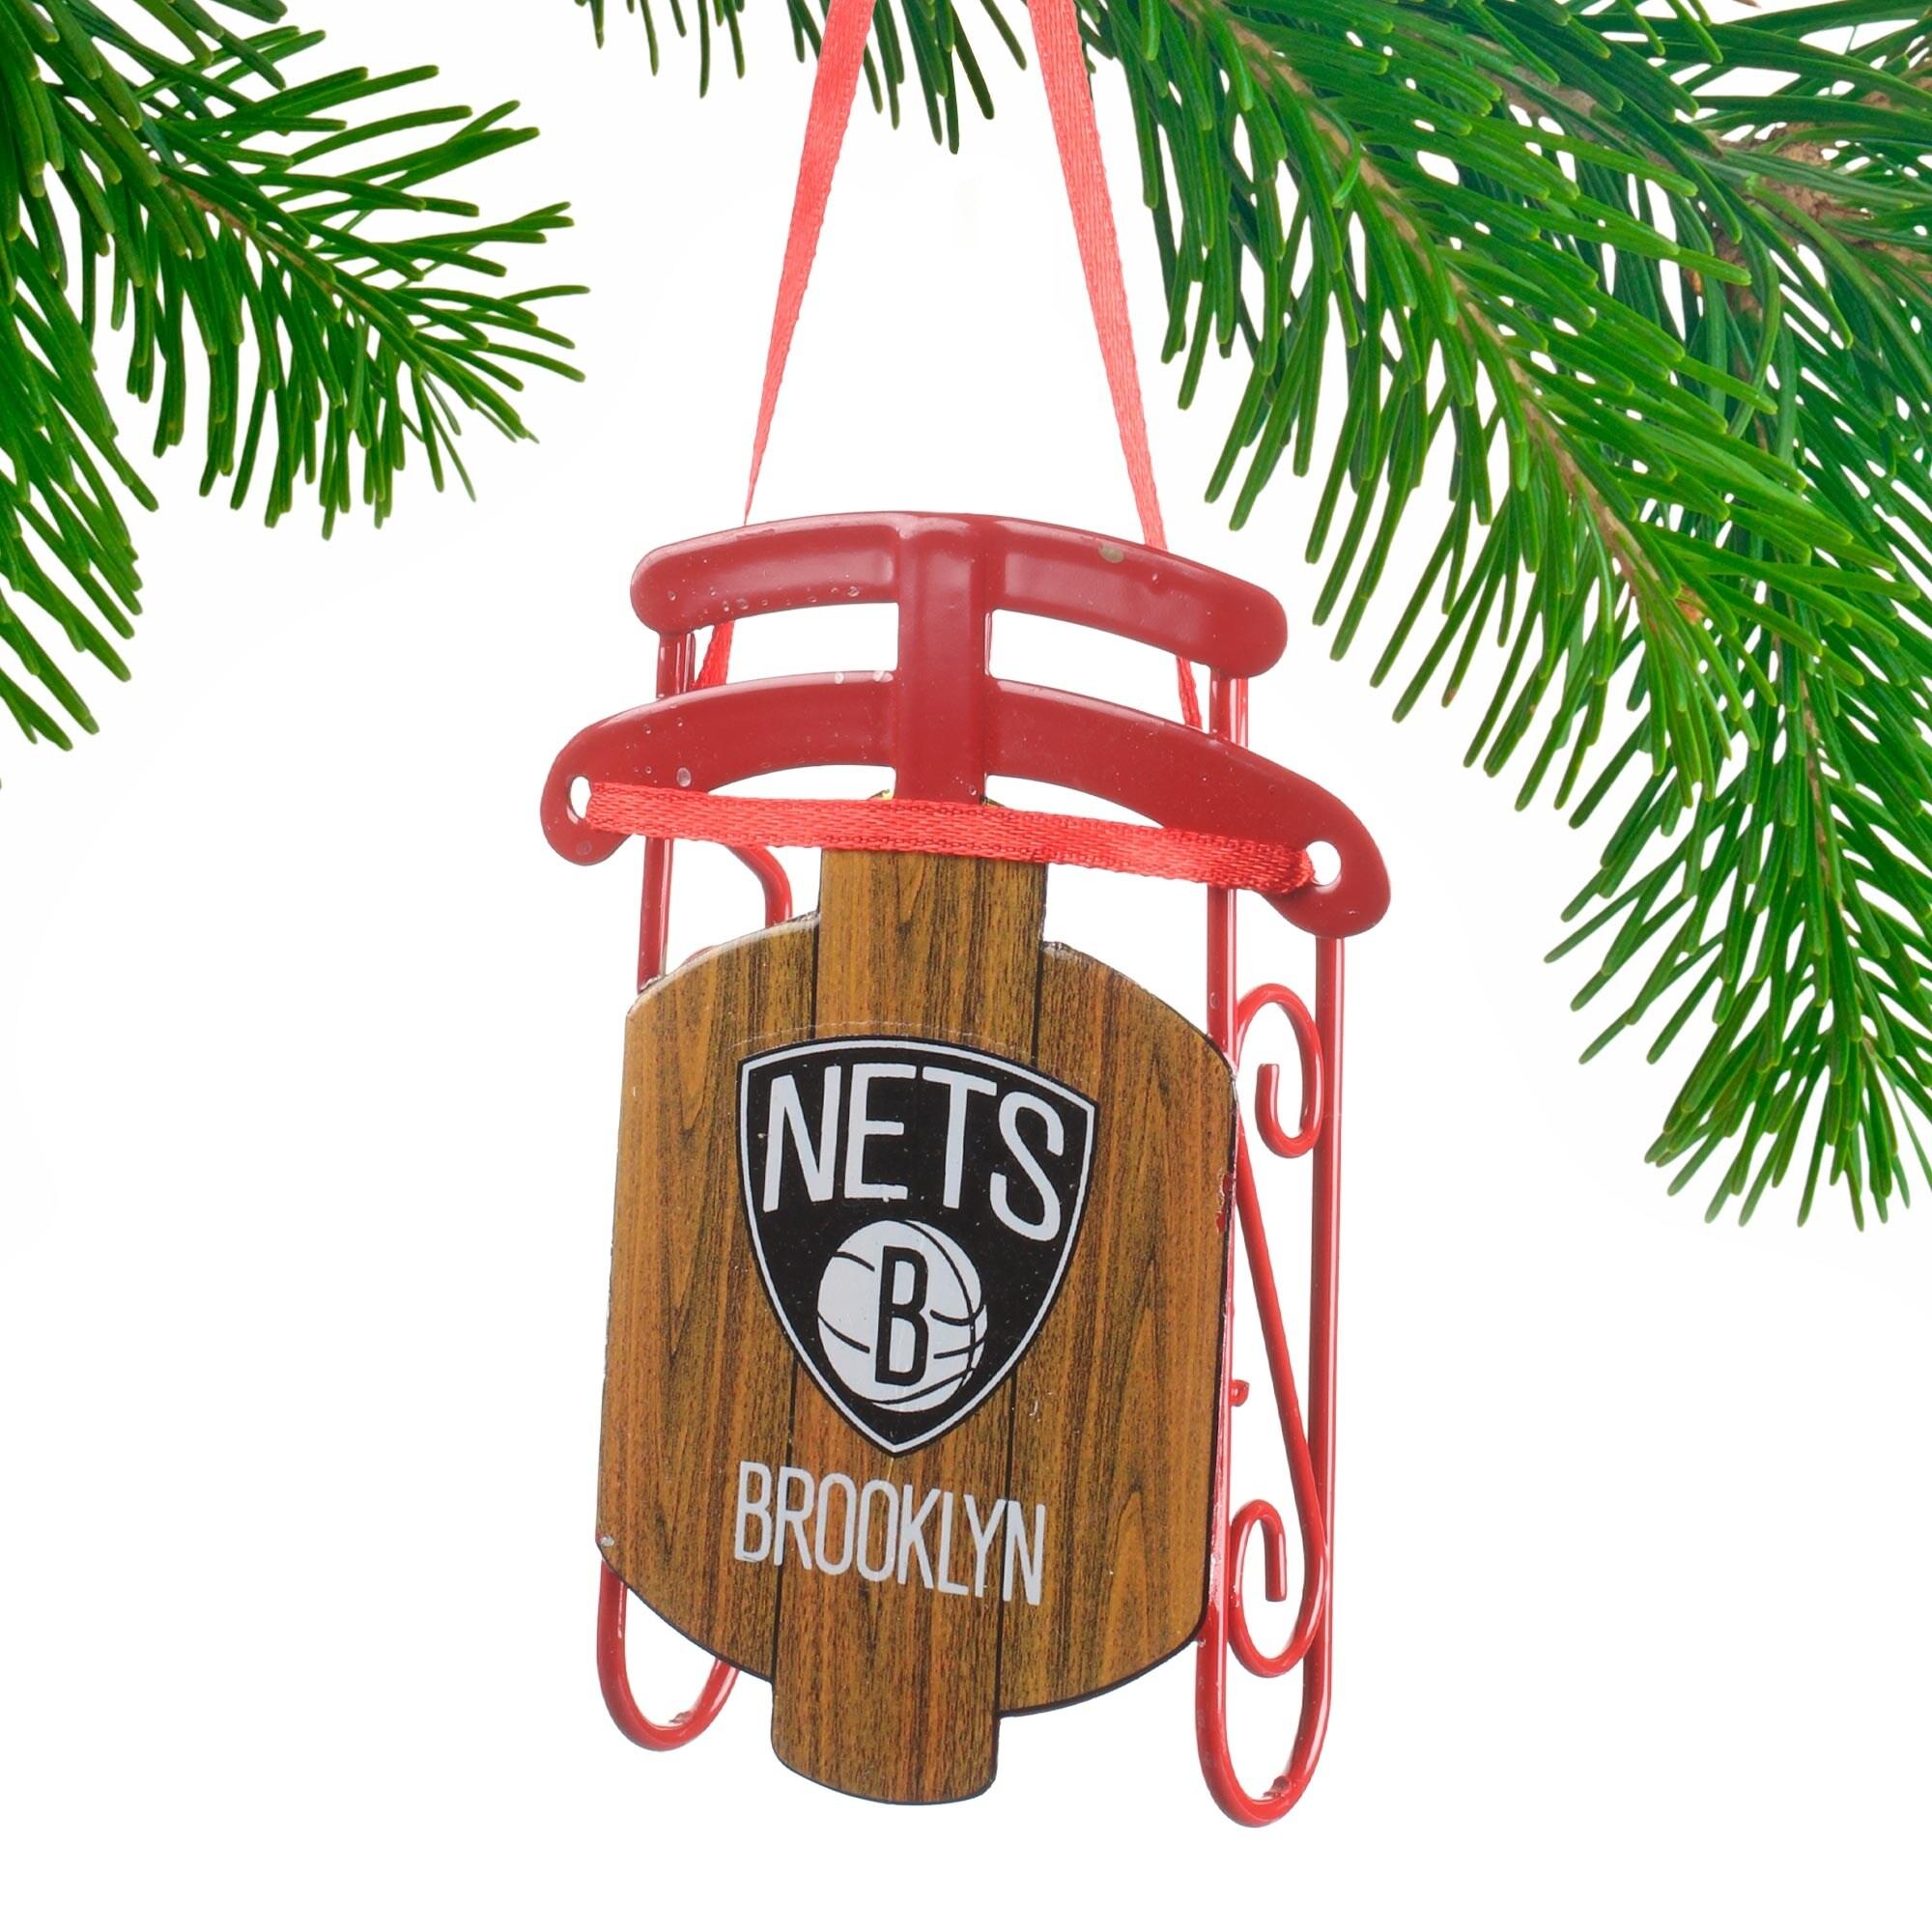 Brooklyn Nets Sled Ornament